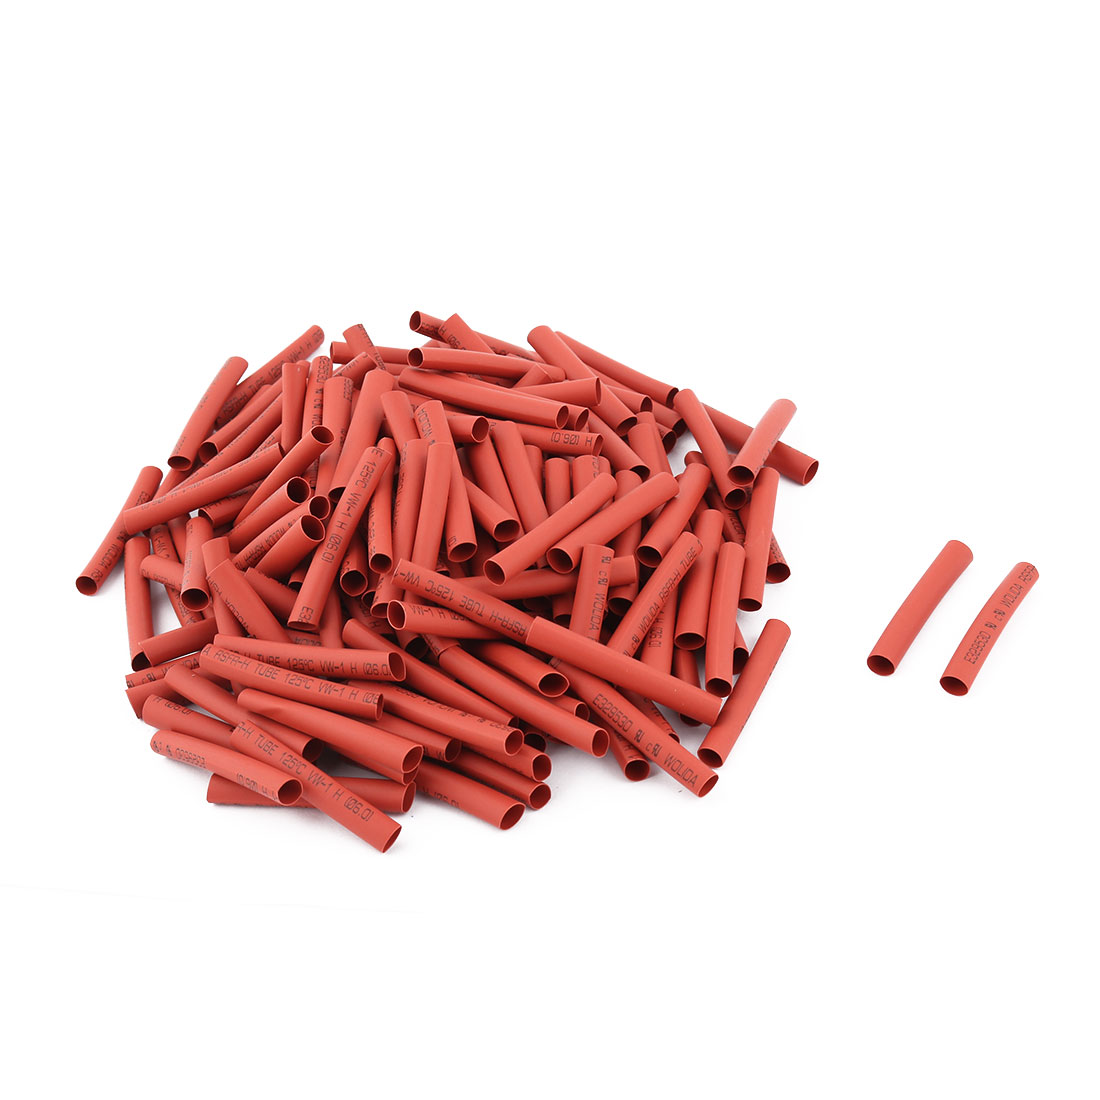 200 Pcs 6mm Dia 50mm Length Heat Shrinkable Tube Shrink Tubing Wire Dark Red